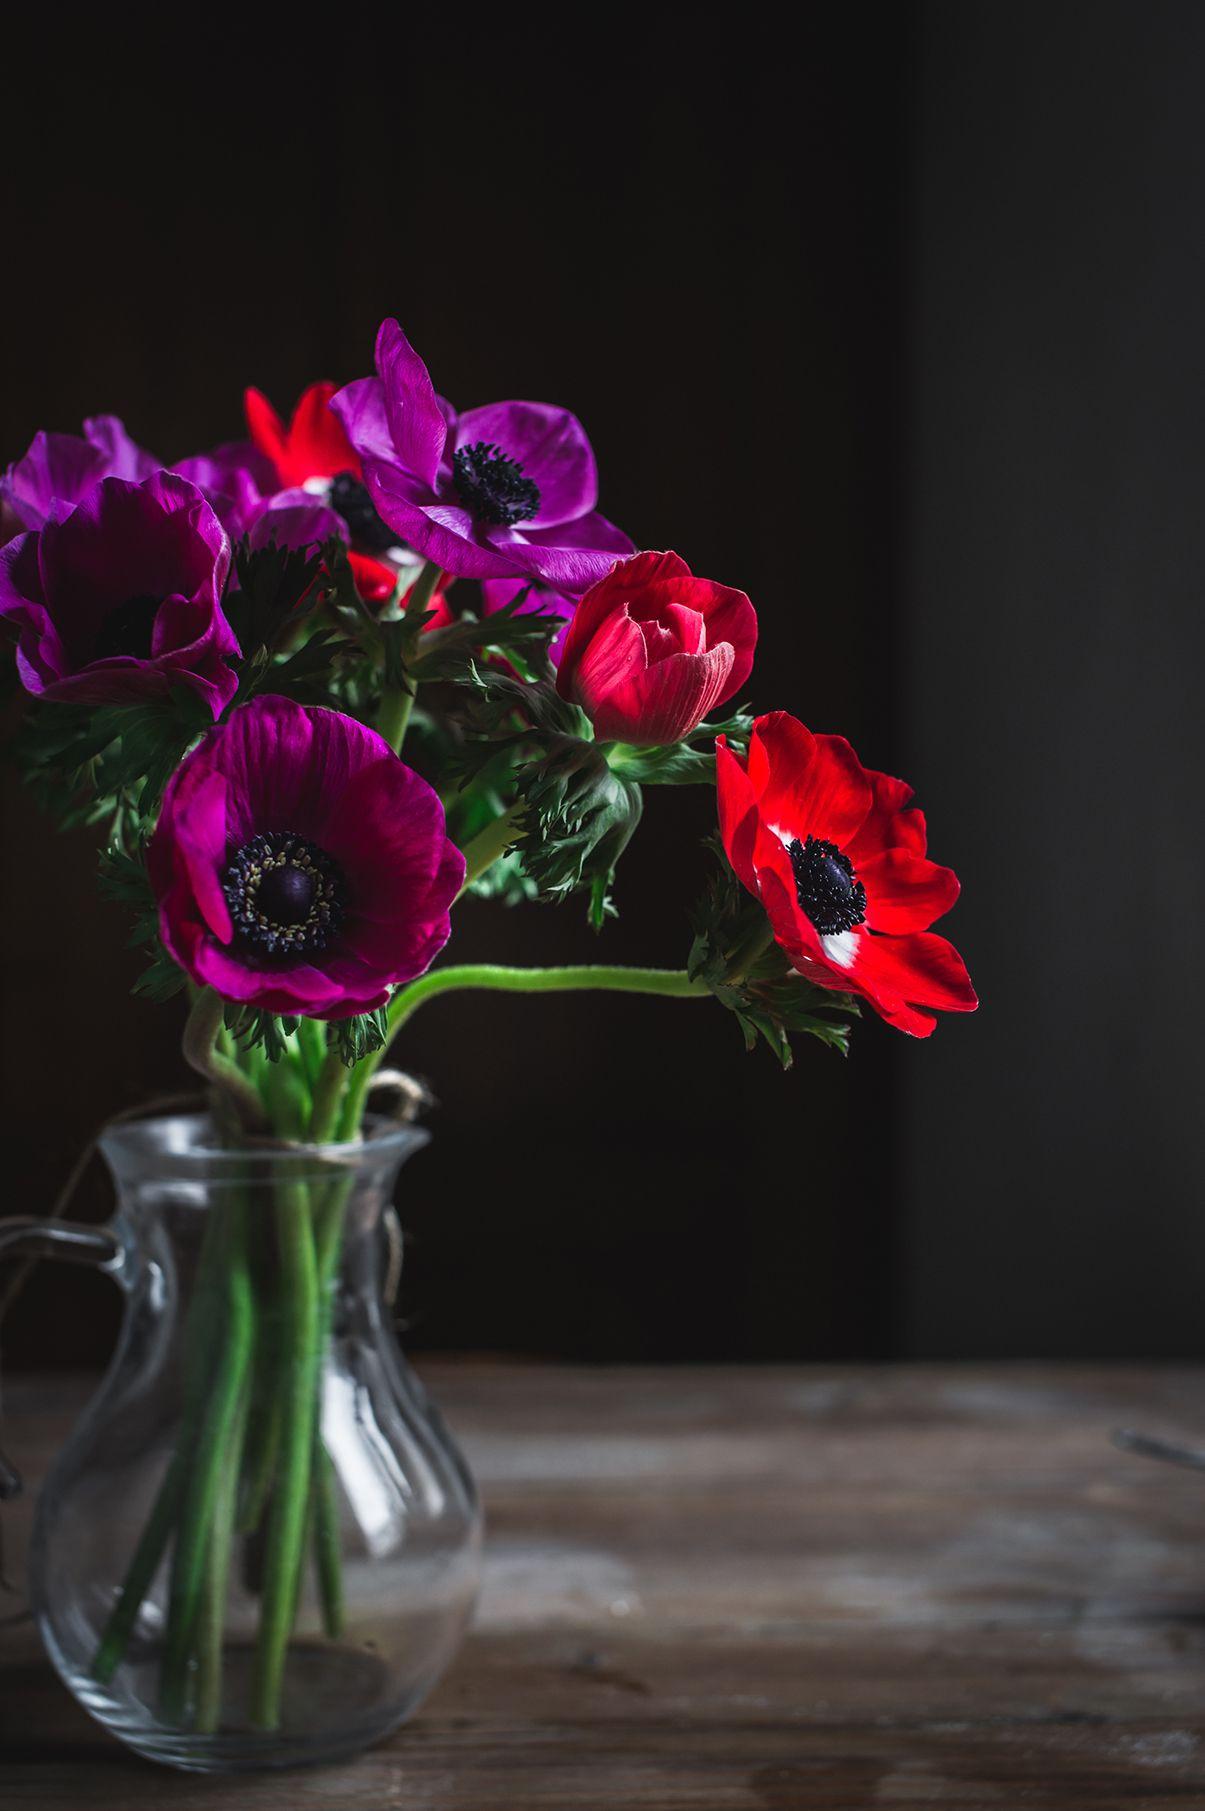 Flowers Composition In 2020 Dark Flowers Anemone Flower Flowers